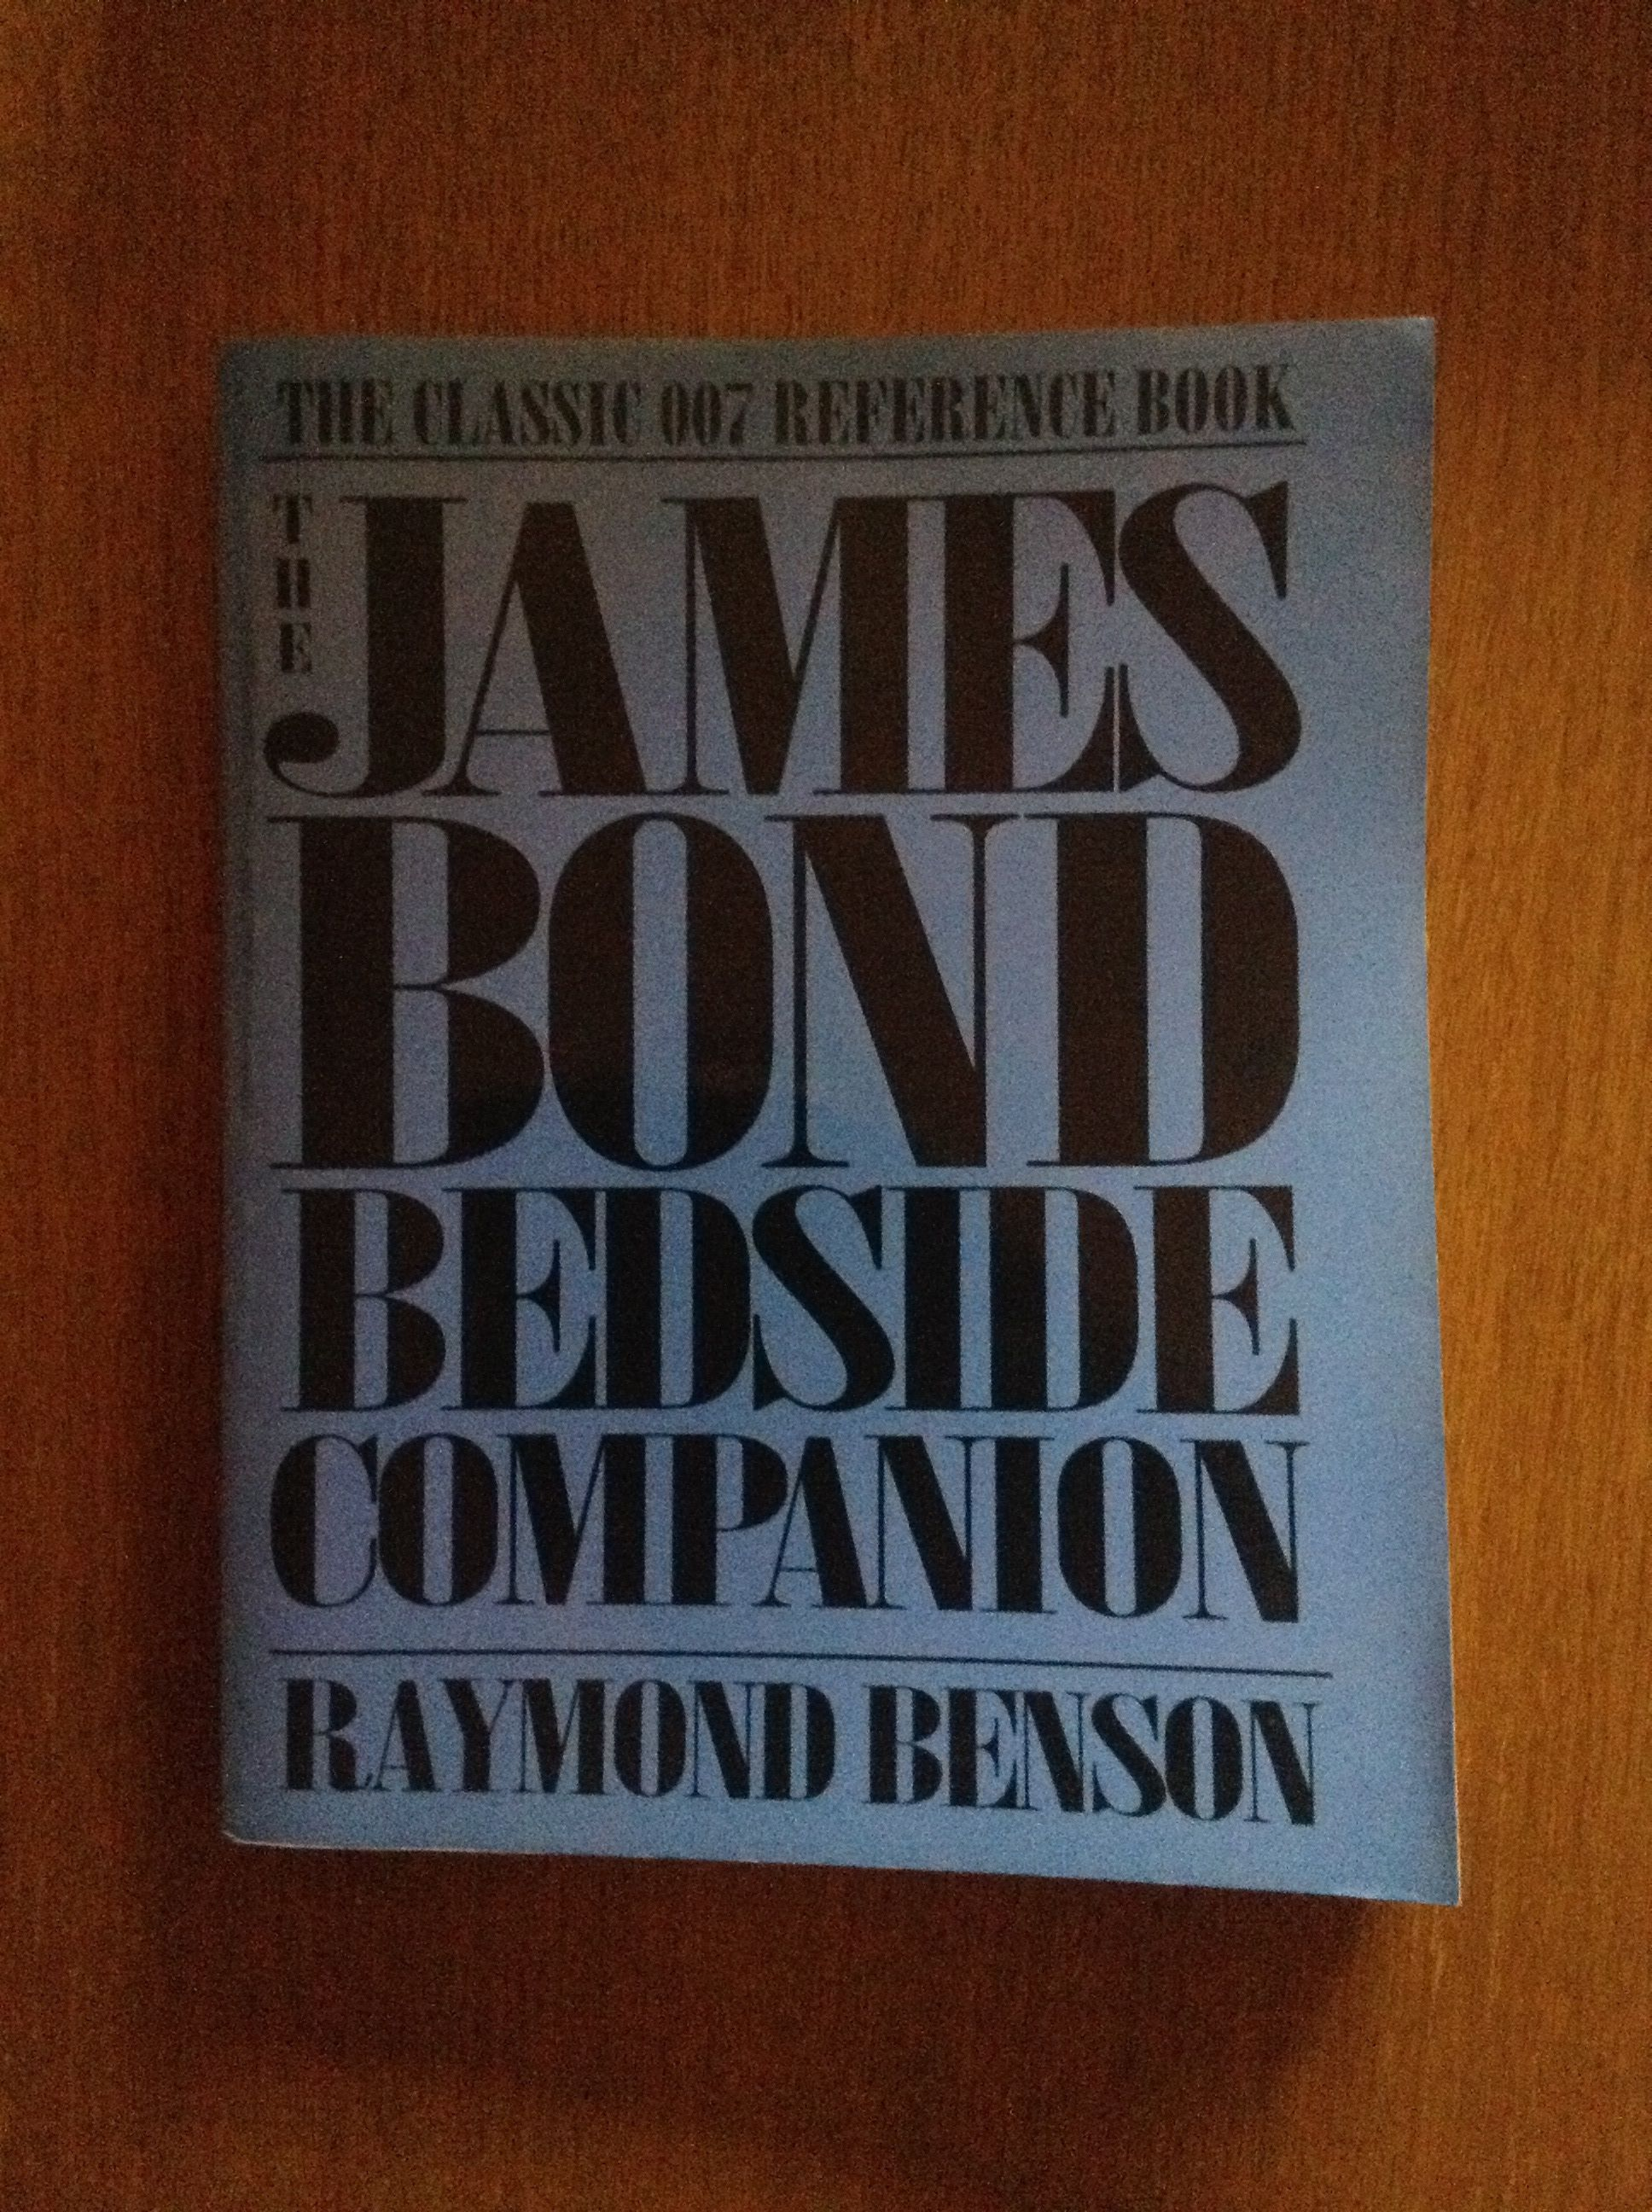 The James Bond Bedside Companion by Raymond Benson. A classic!